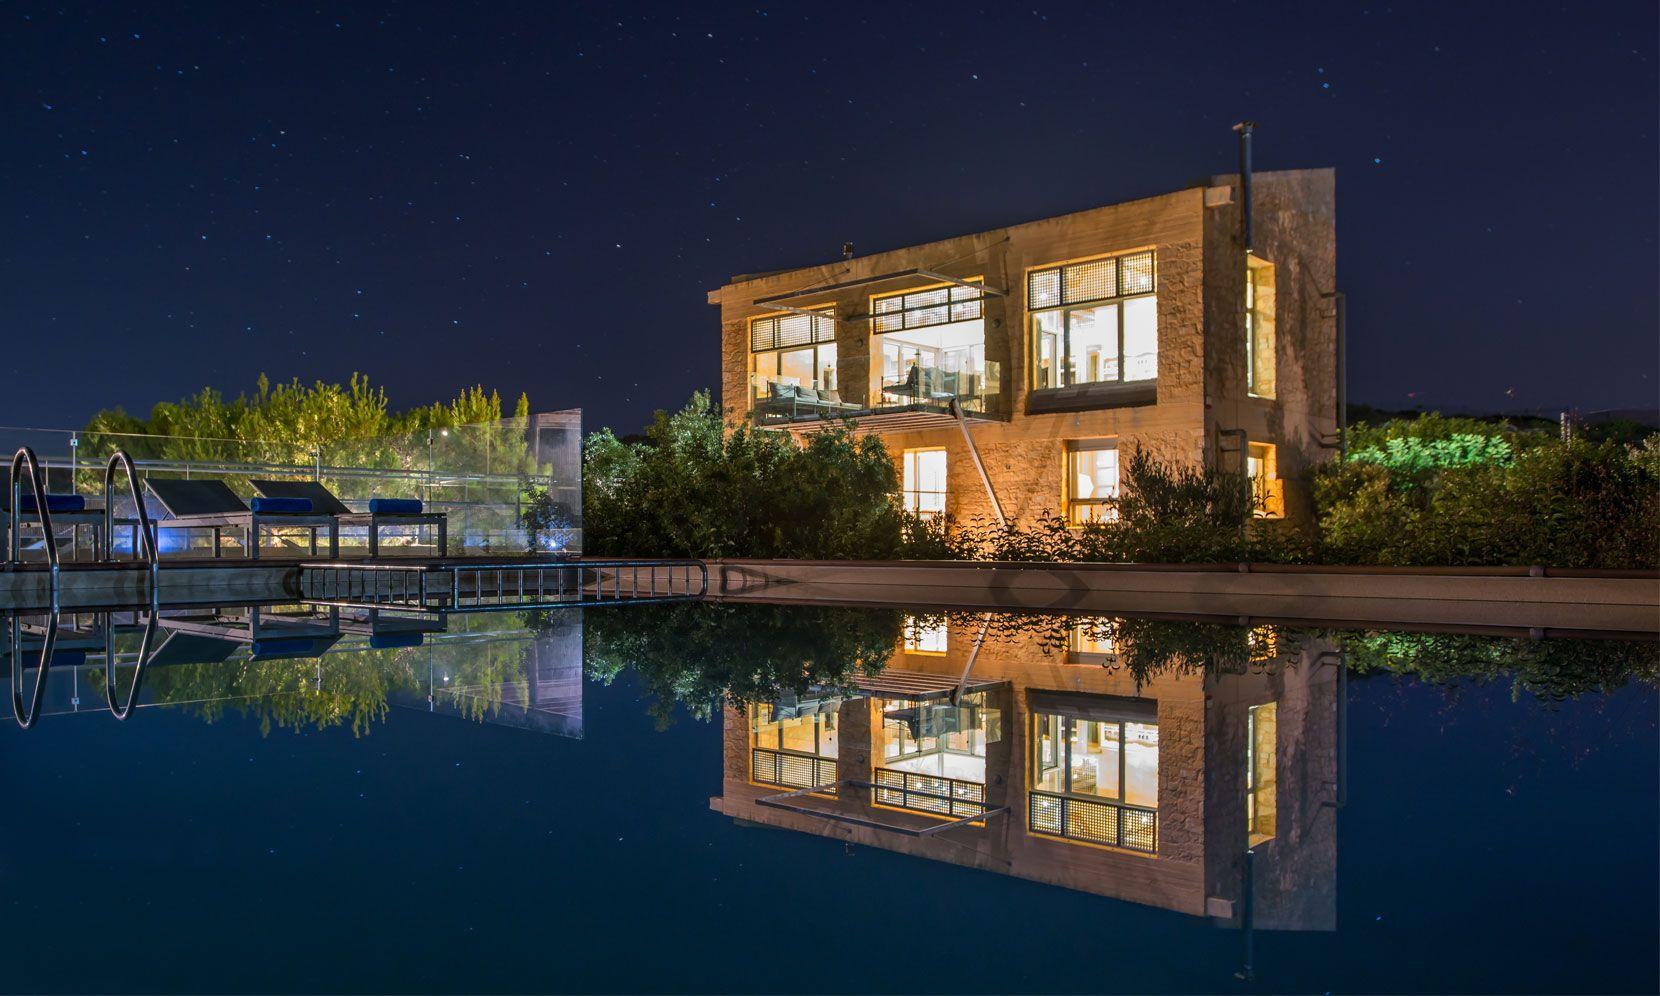 Crete Villa Albion jumbotron image